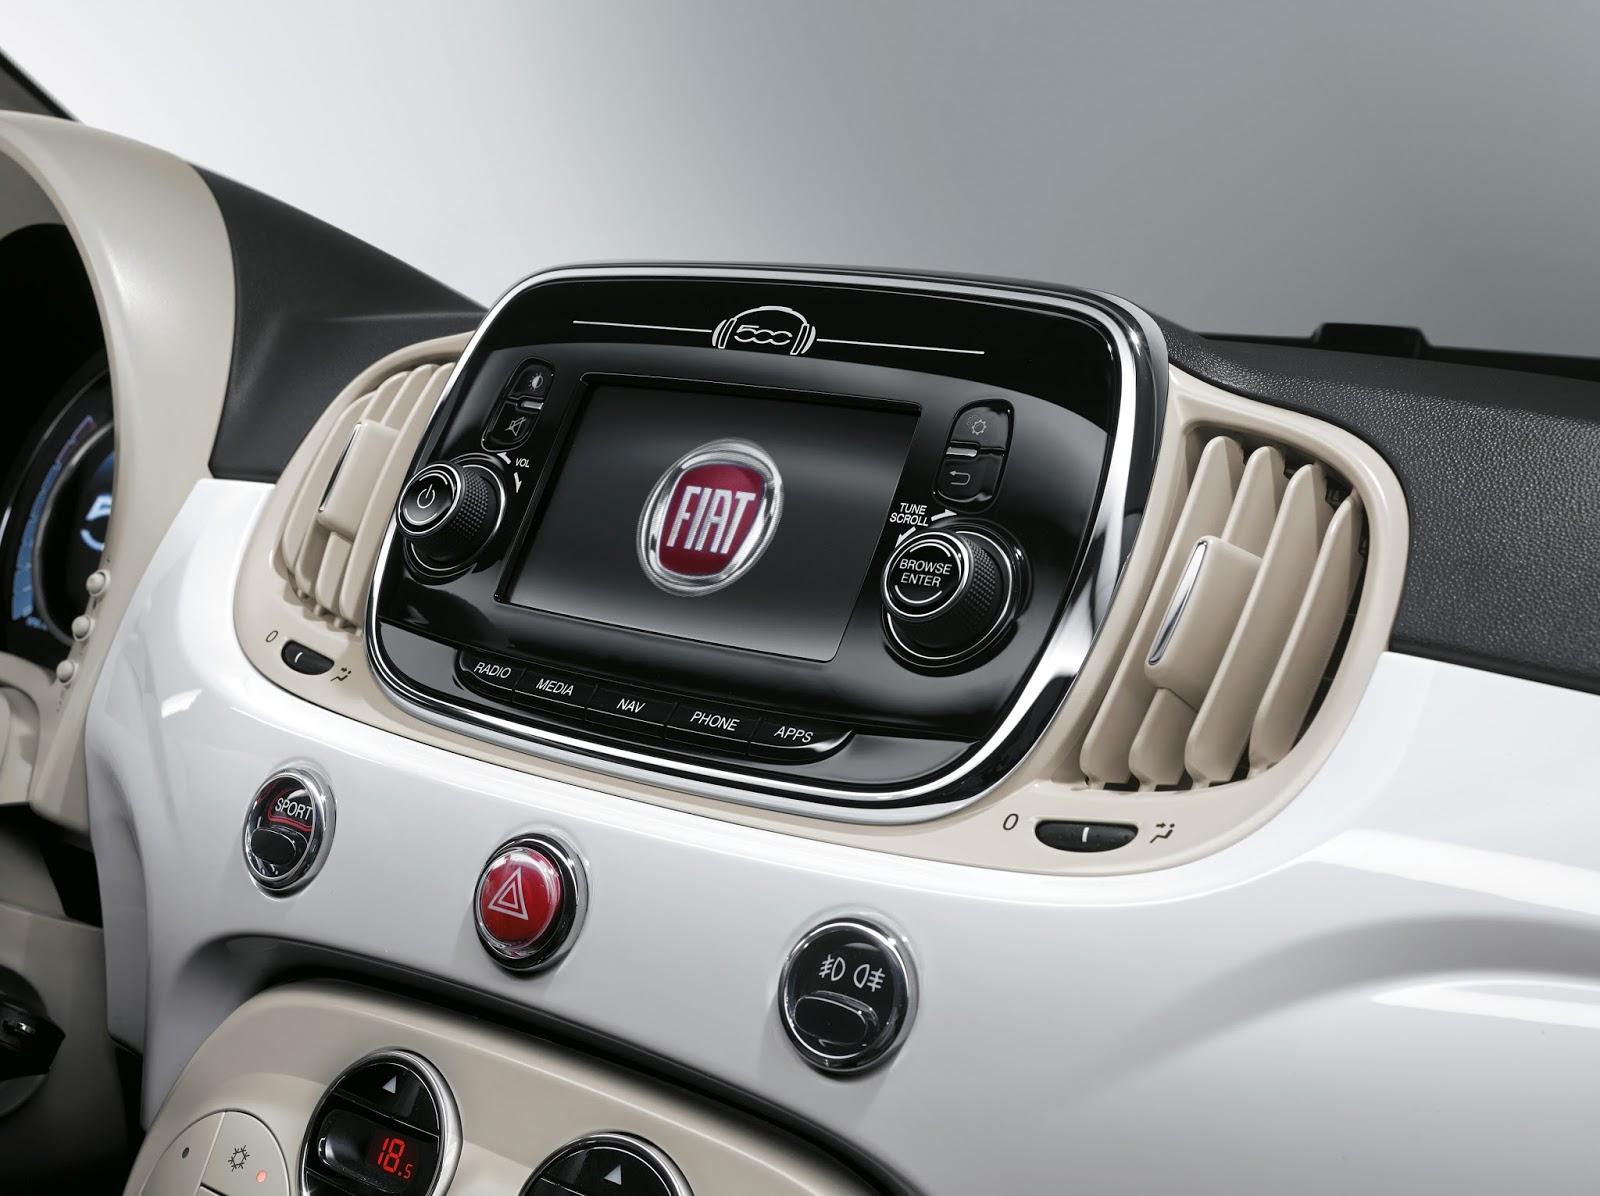 150703 FIAT Nuova 500 46 Η άφιξη του νέου Fiat 500 είναι γεγονός